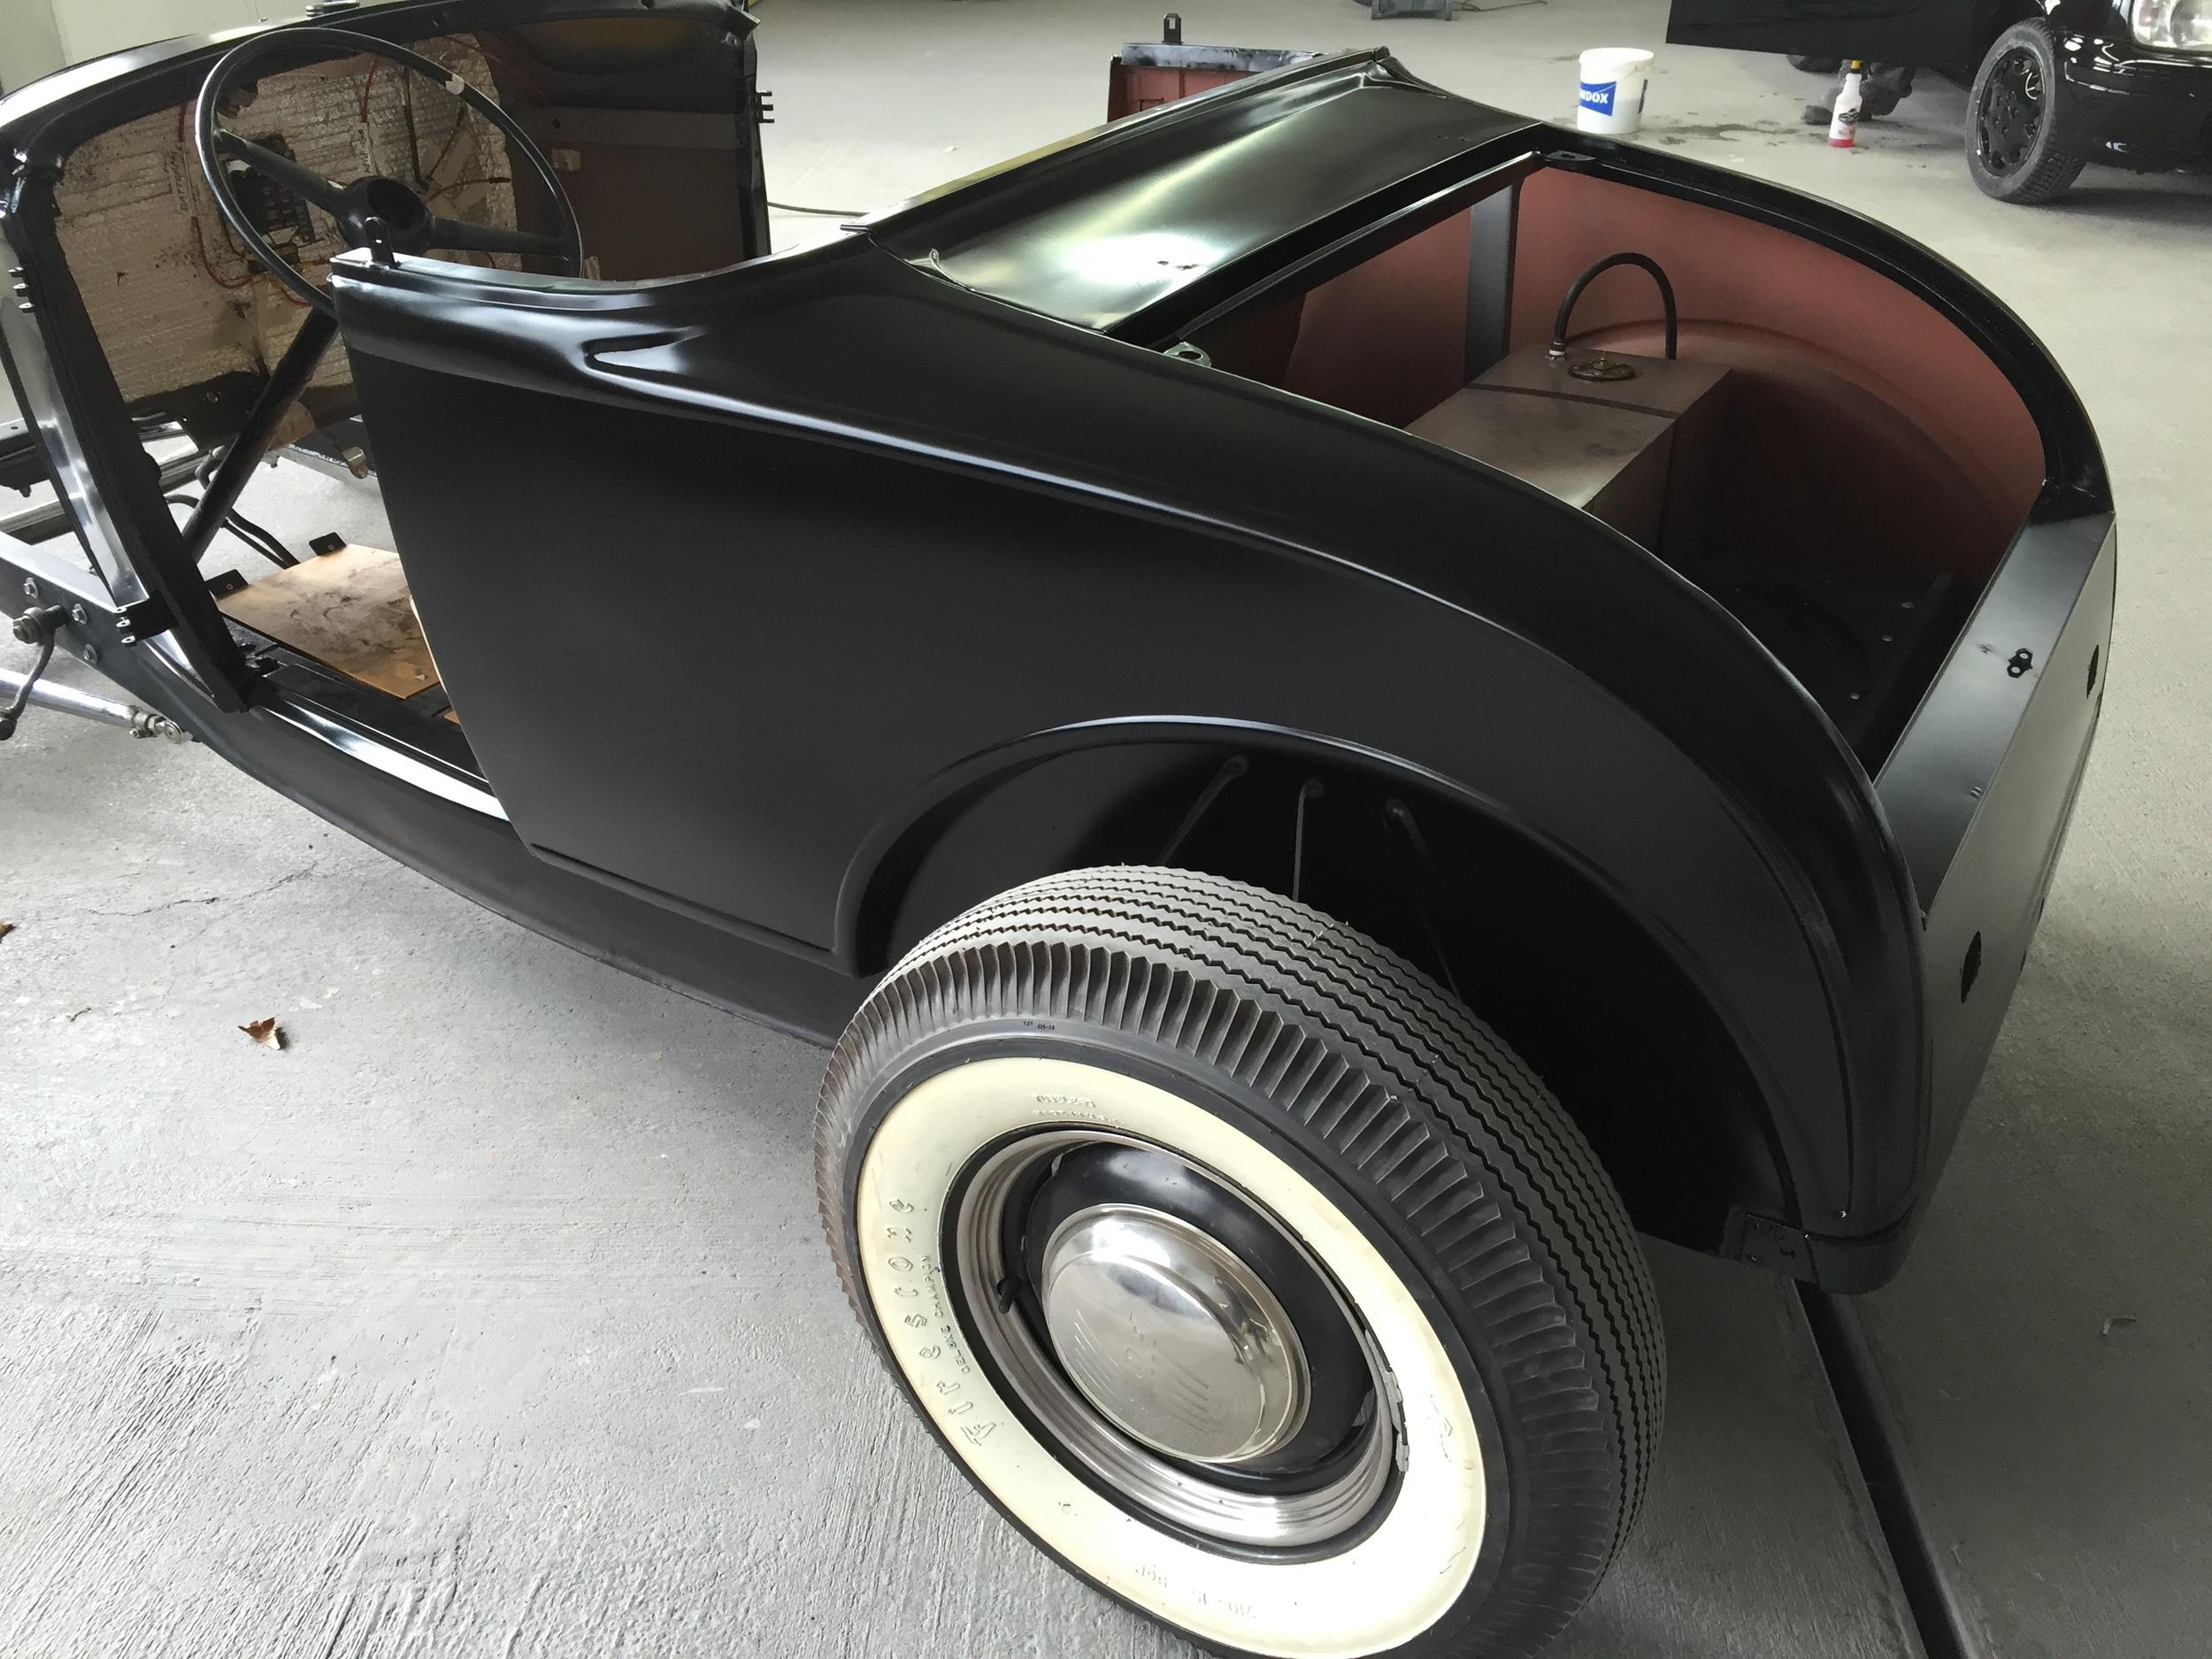 lackierung spritzwerk carriot Hot Rod Ford 1932.jpg